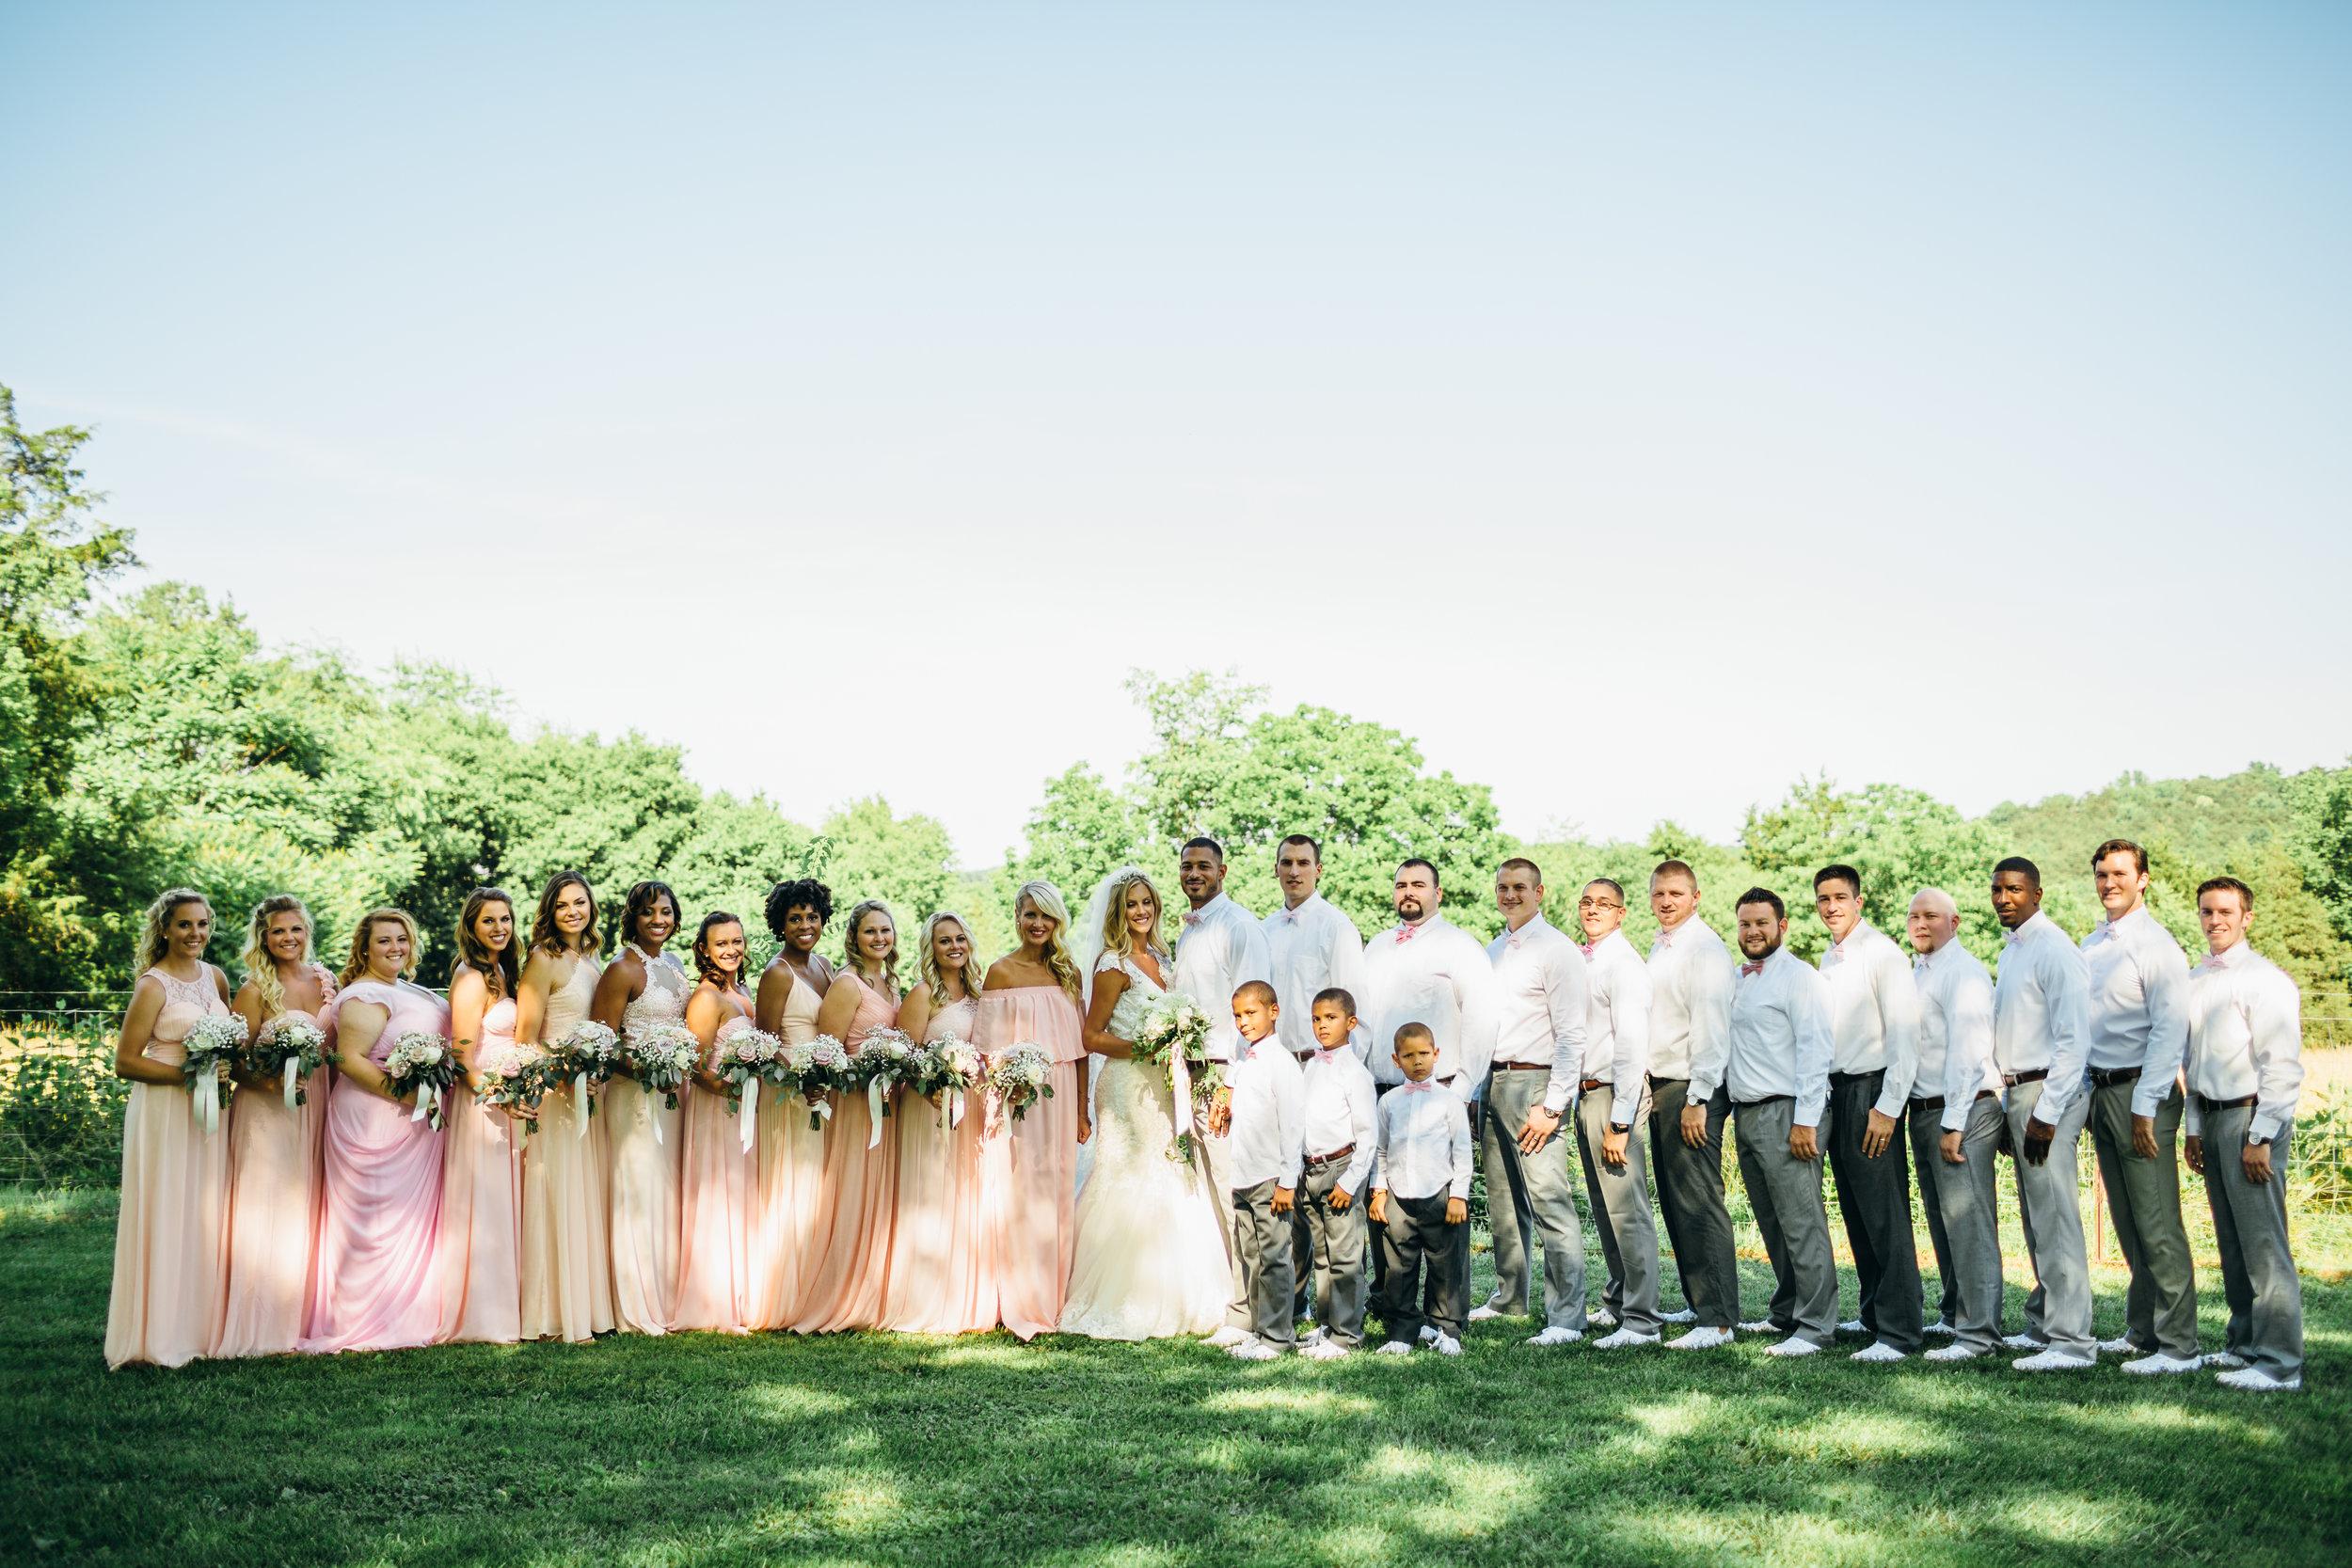 Lynchburg Wedding Photographer; Lynchburg Photographer; Lynchburg Wedding; Sorella Farms Wedding; Virginia Wedding Photographer; Virginia Wedding-16.jpg